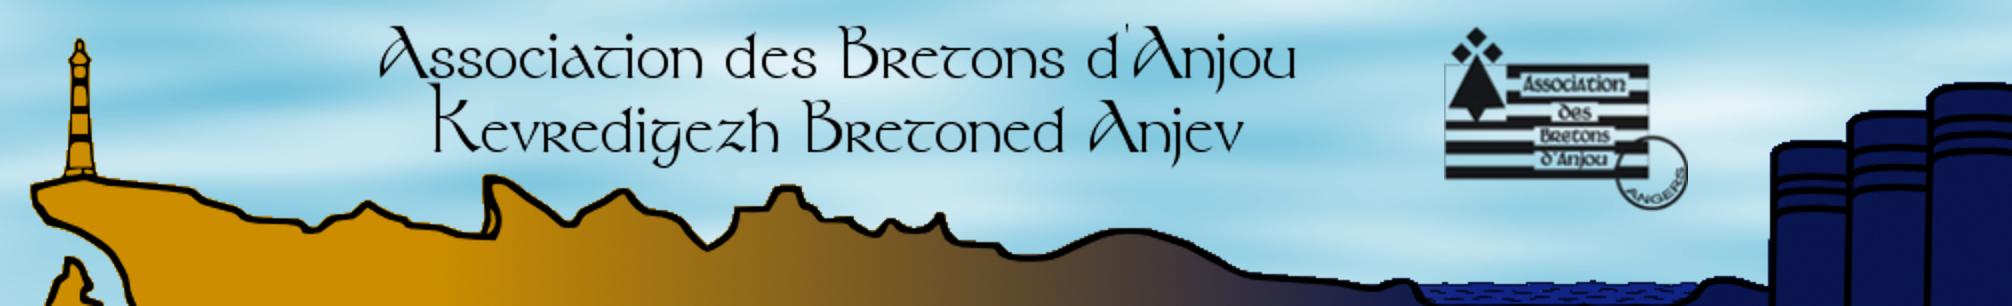 KBA Association des Bretons d'Anjou